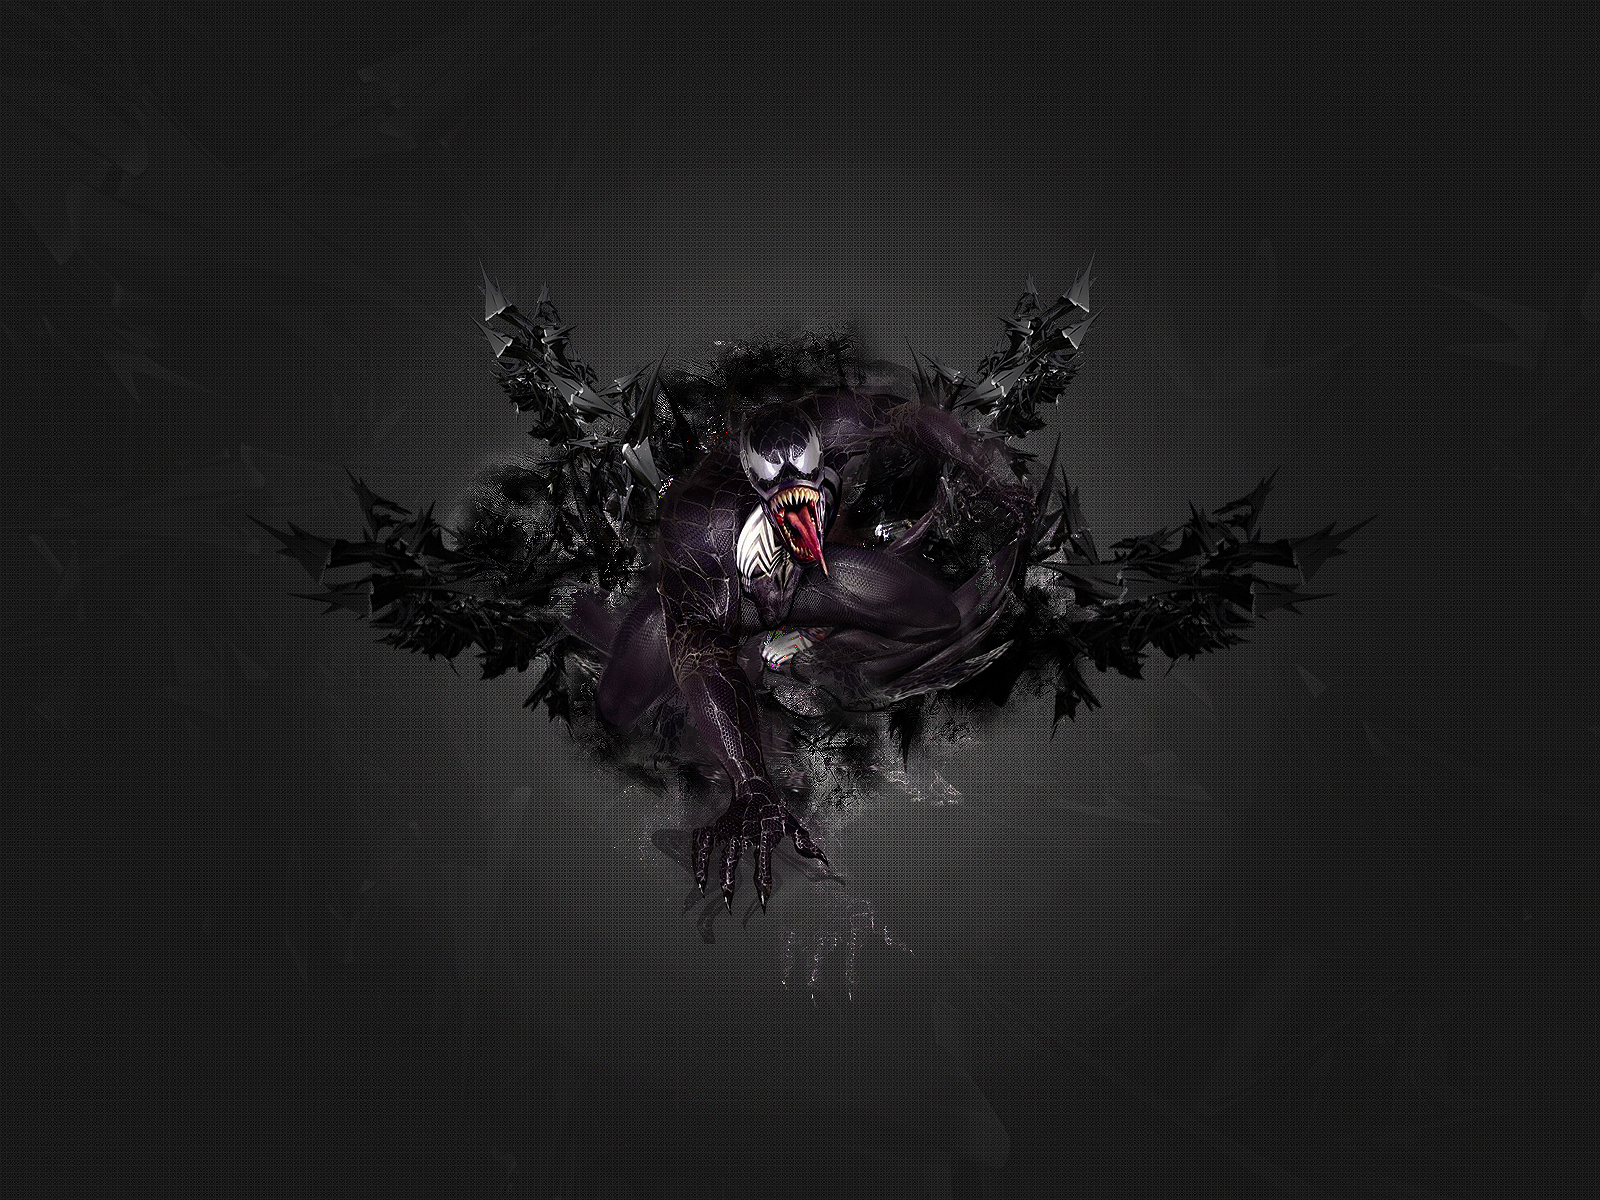 Venom wallpaper and background image 1600x1200 id31702 comics venom wallpaper voltagebd Image collections